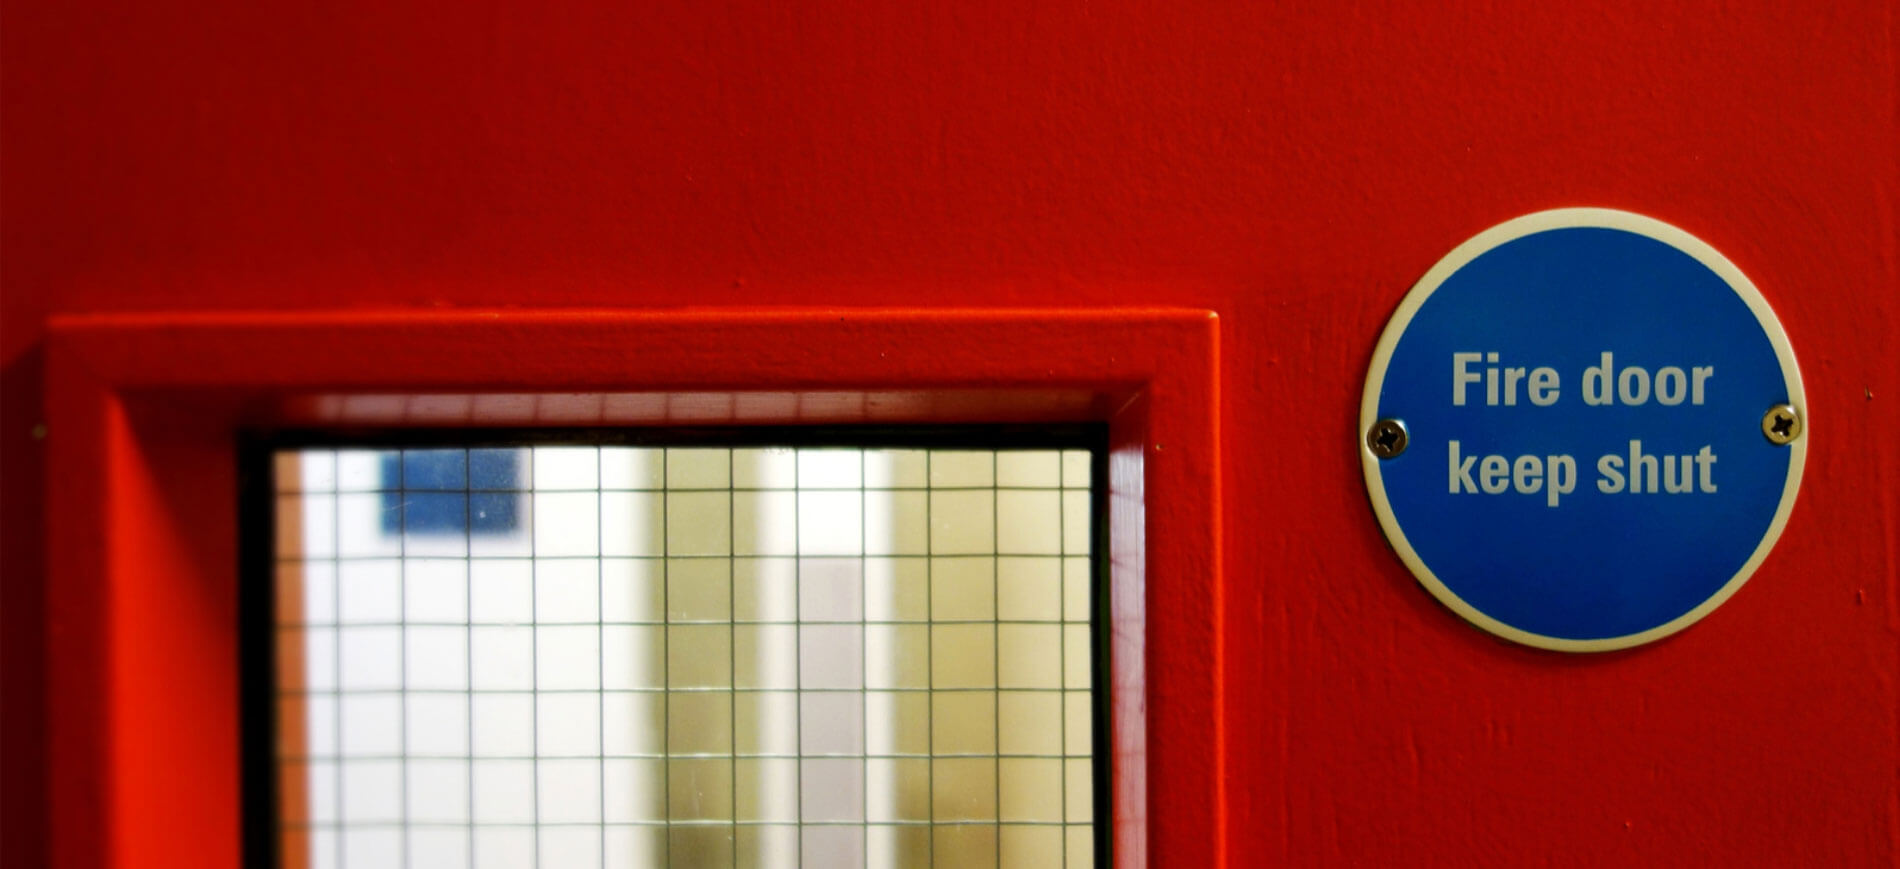 Mandatory Fire Door Instruction Signs